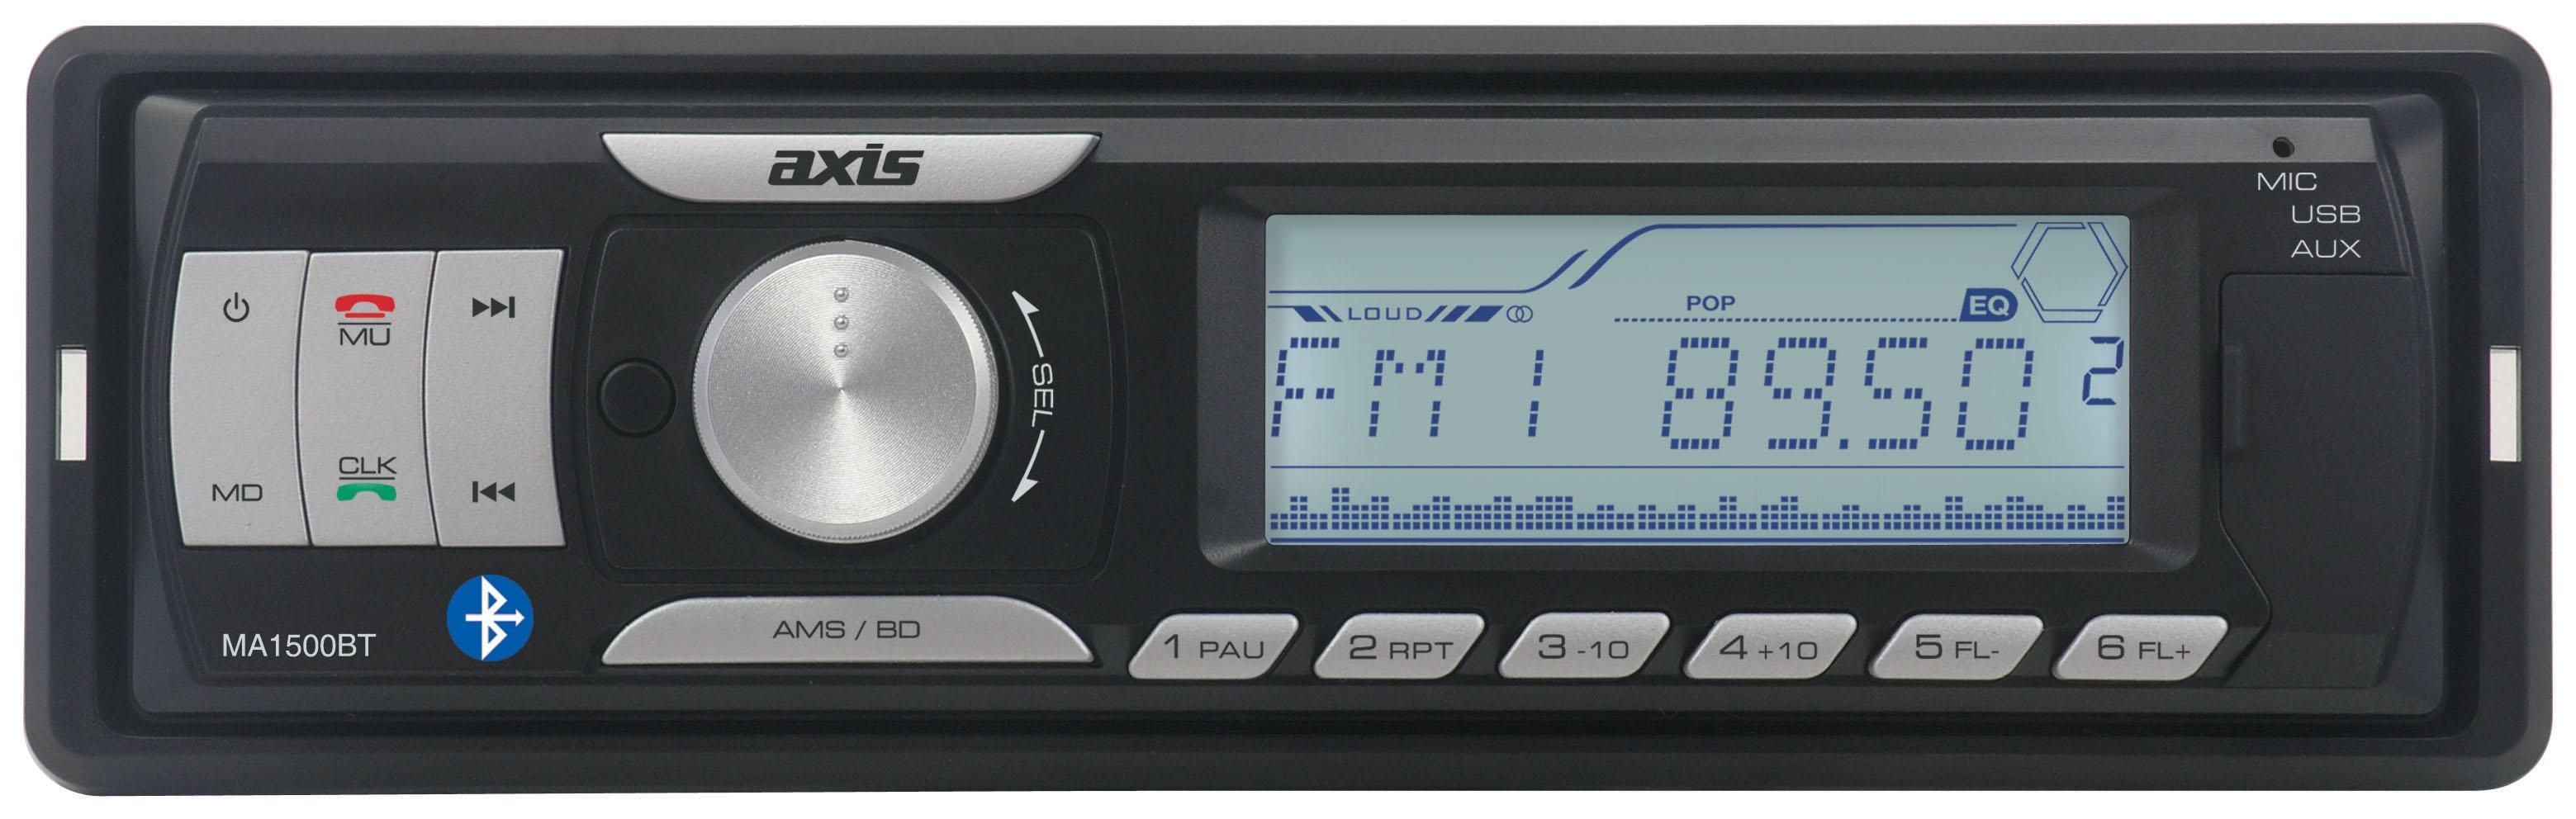 radio MA1500BT-1